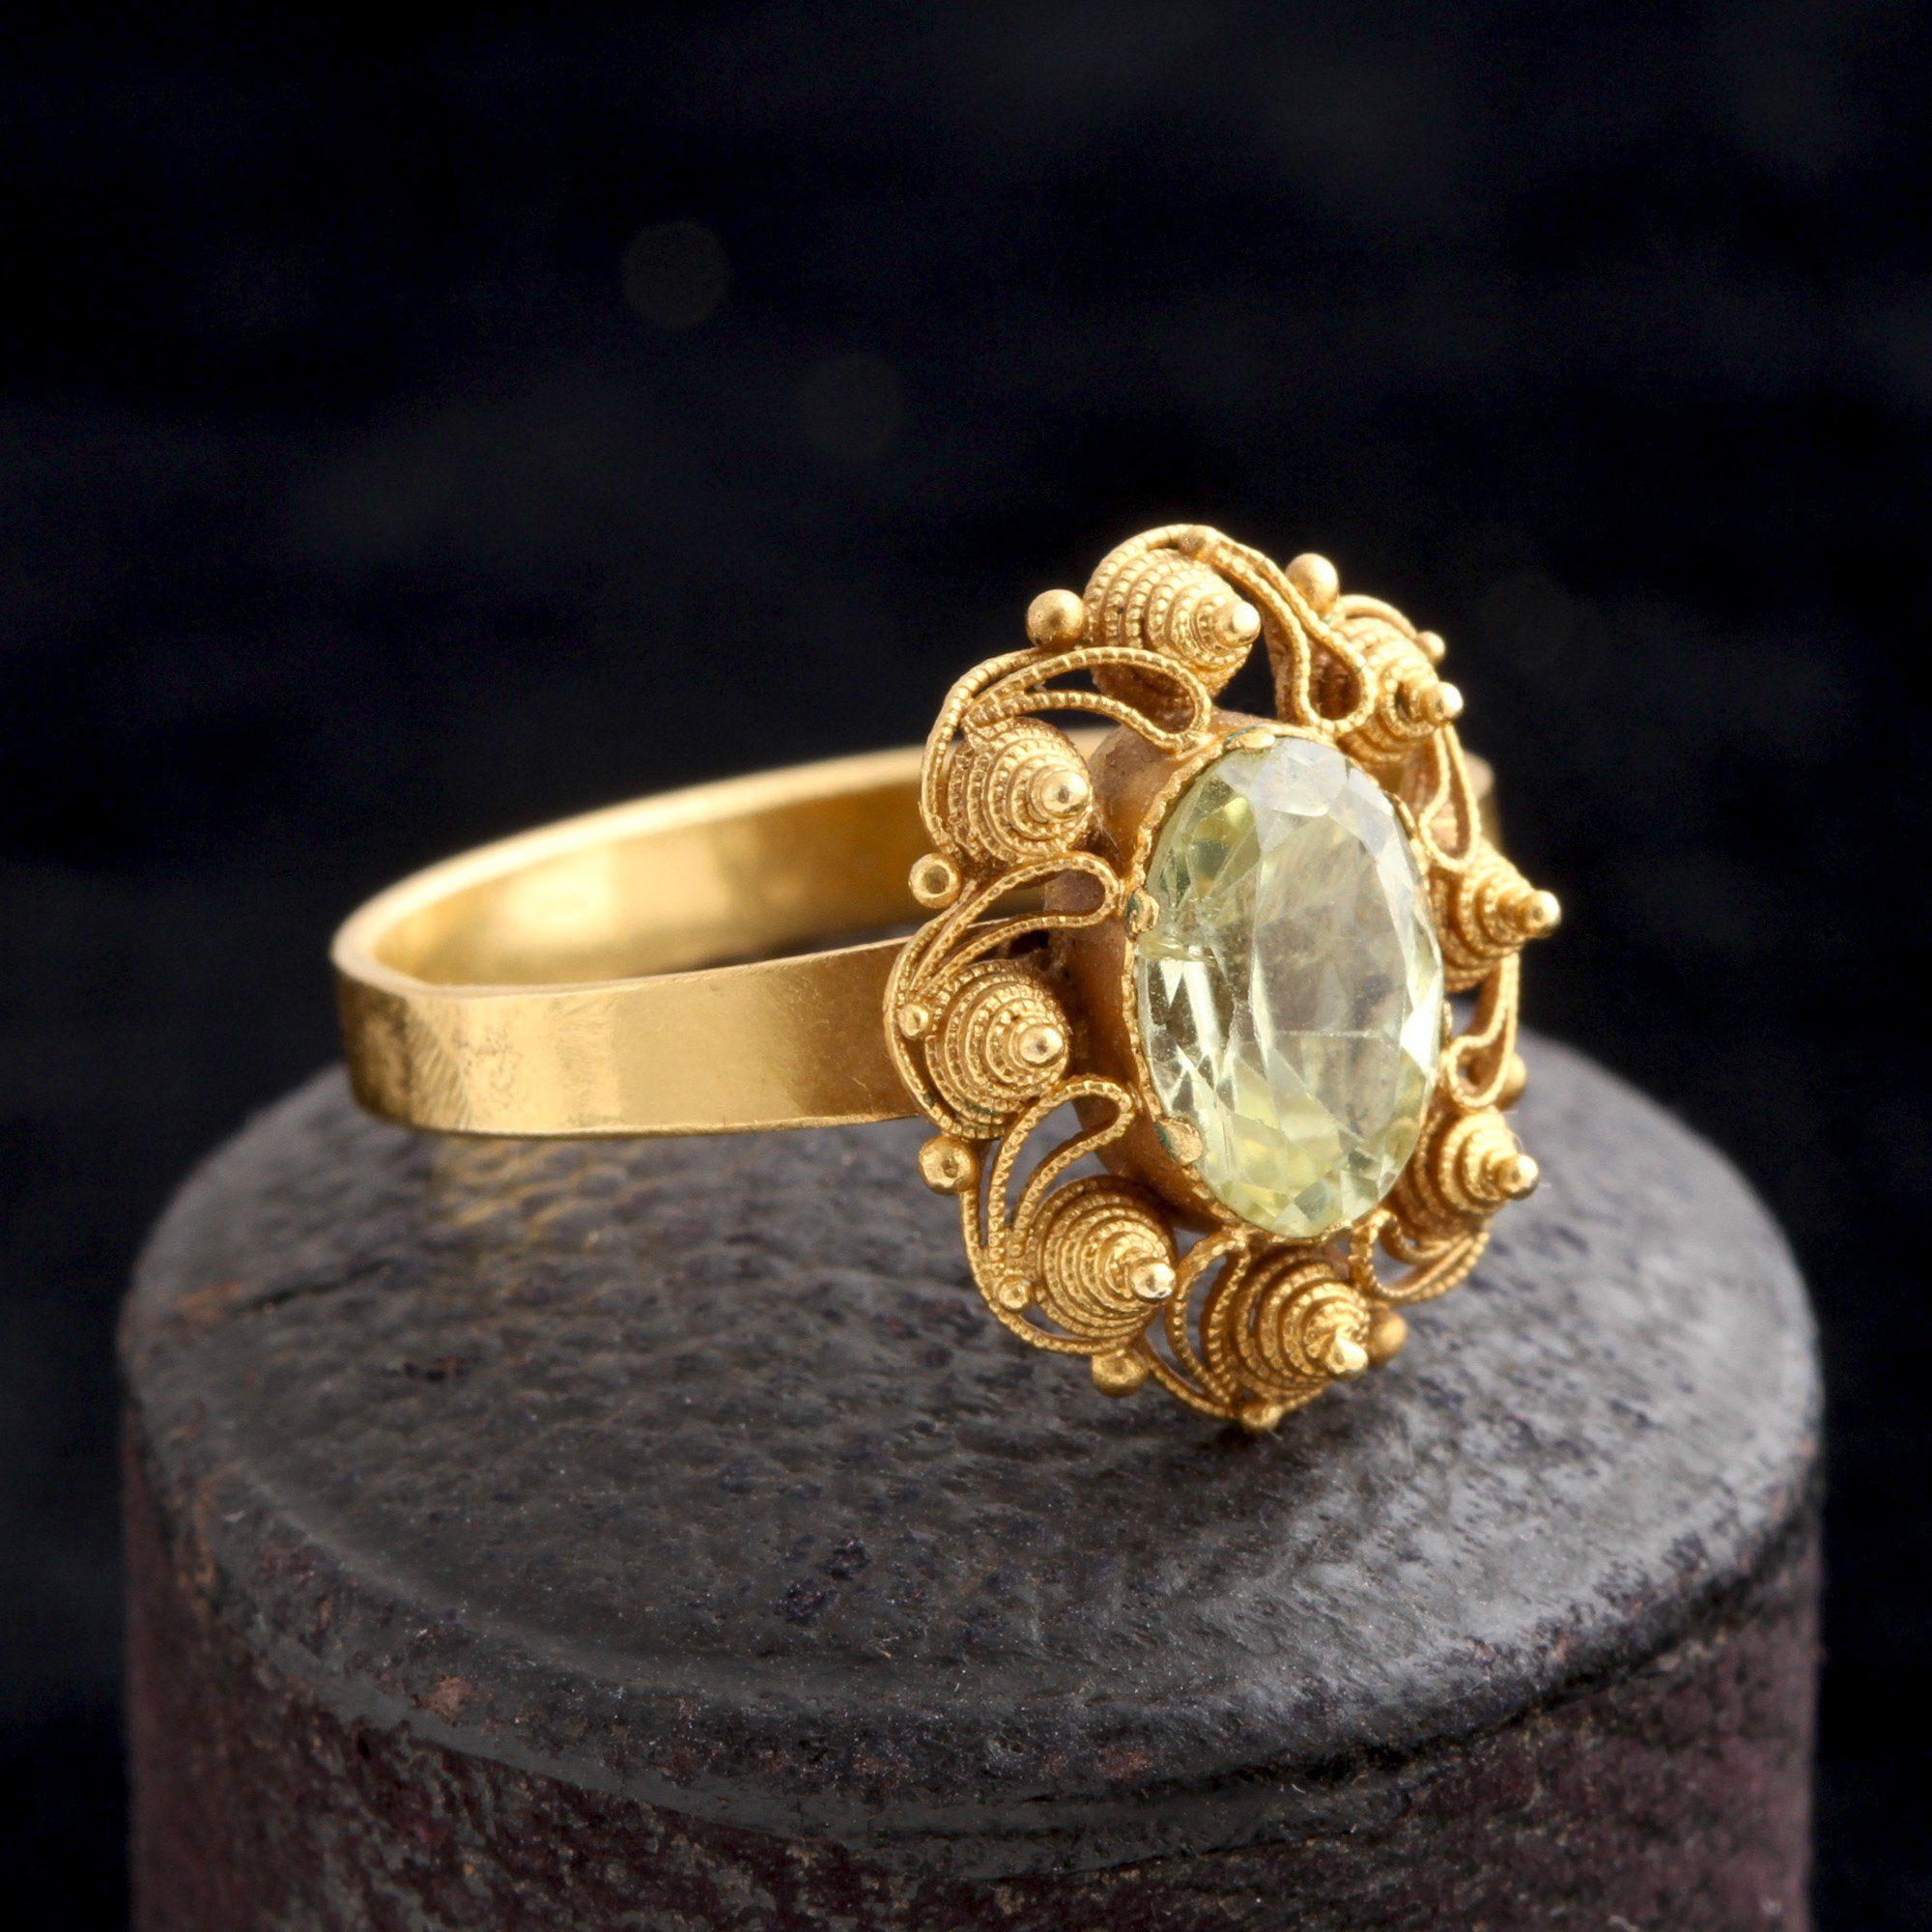 Victorian Etruscan Revival Chrysoberyl Ring